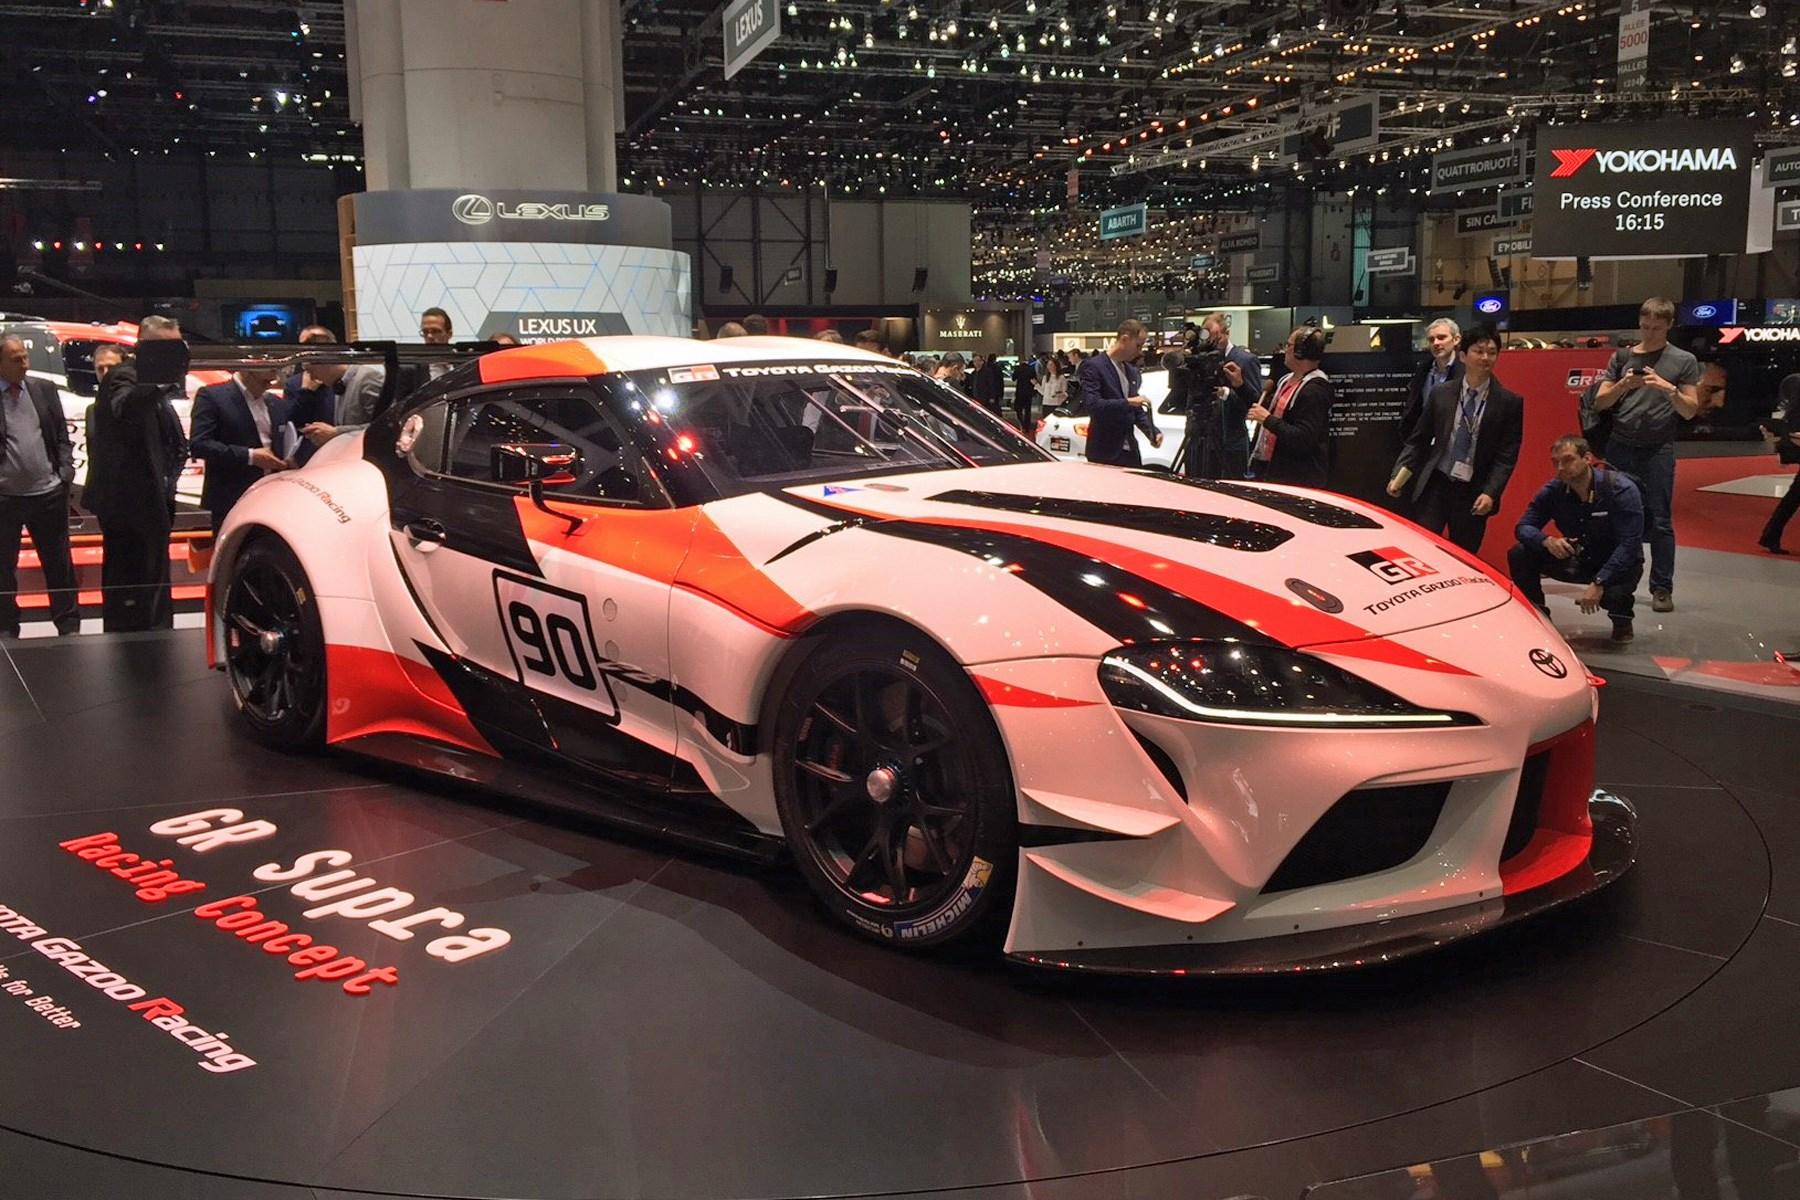 Geneva Motor Show: Toyota Unveils GR Supra Racing Concept